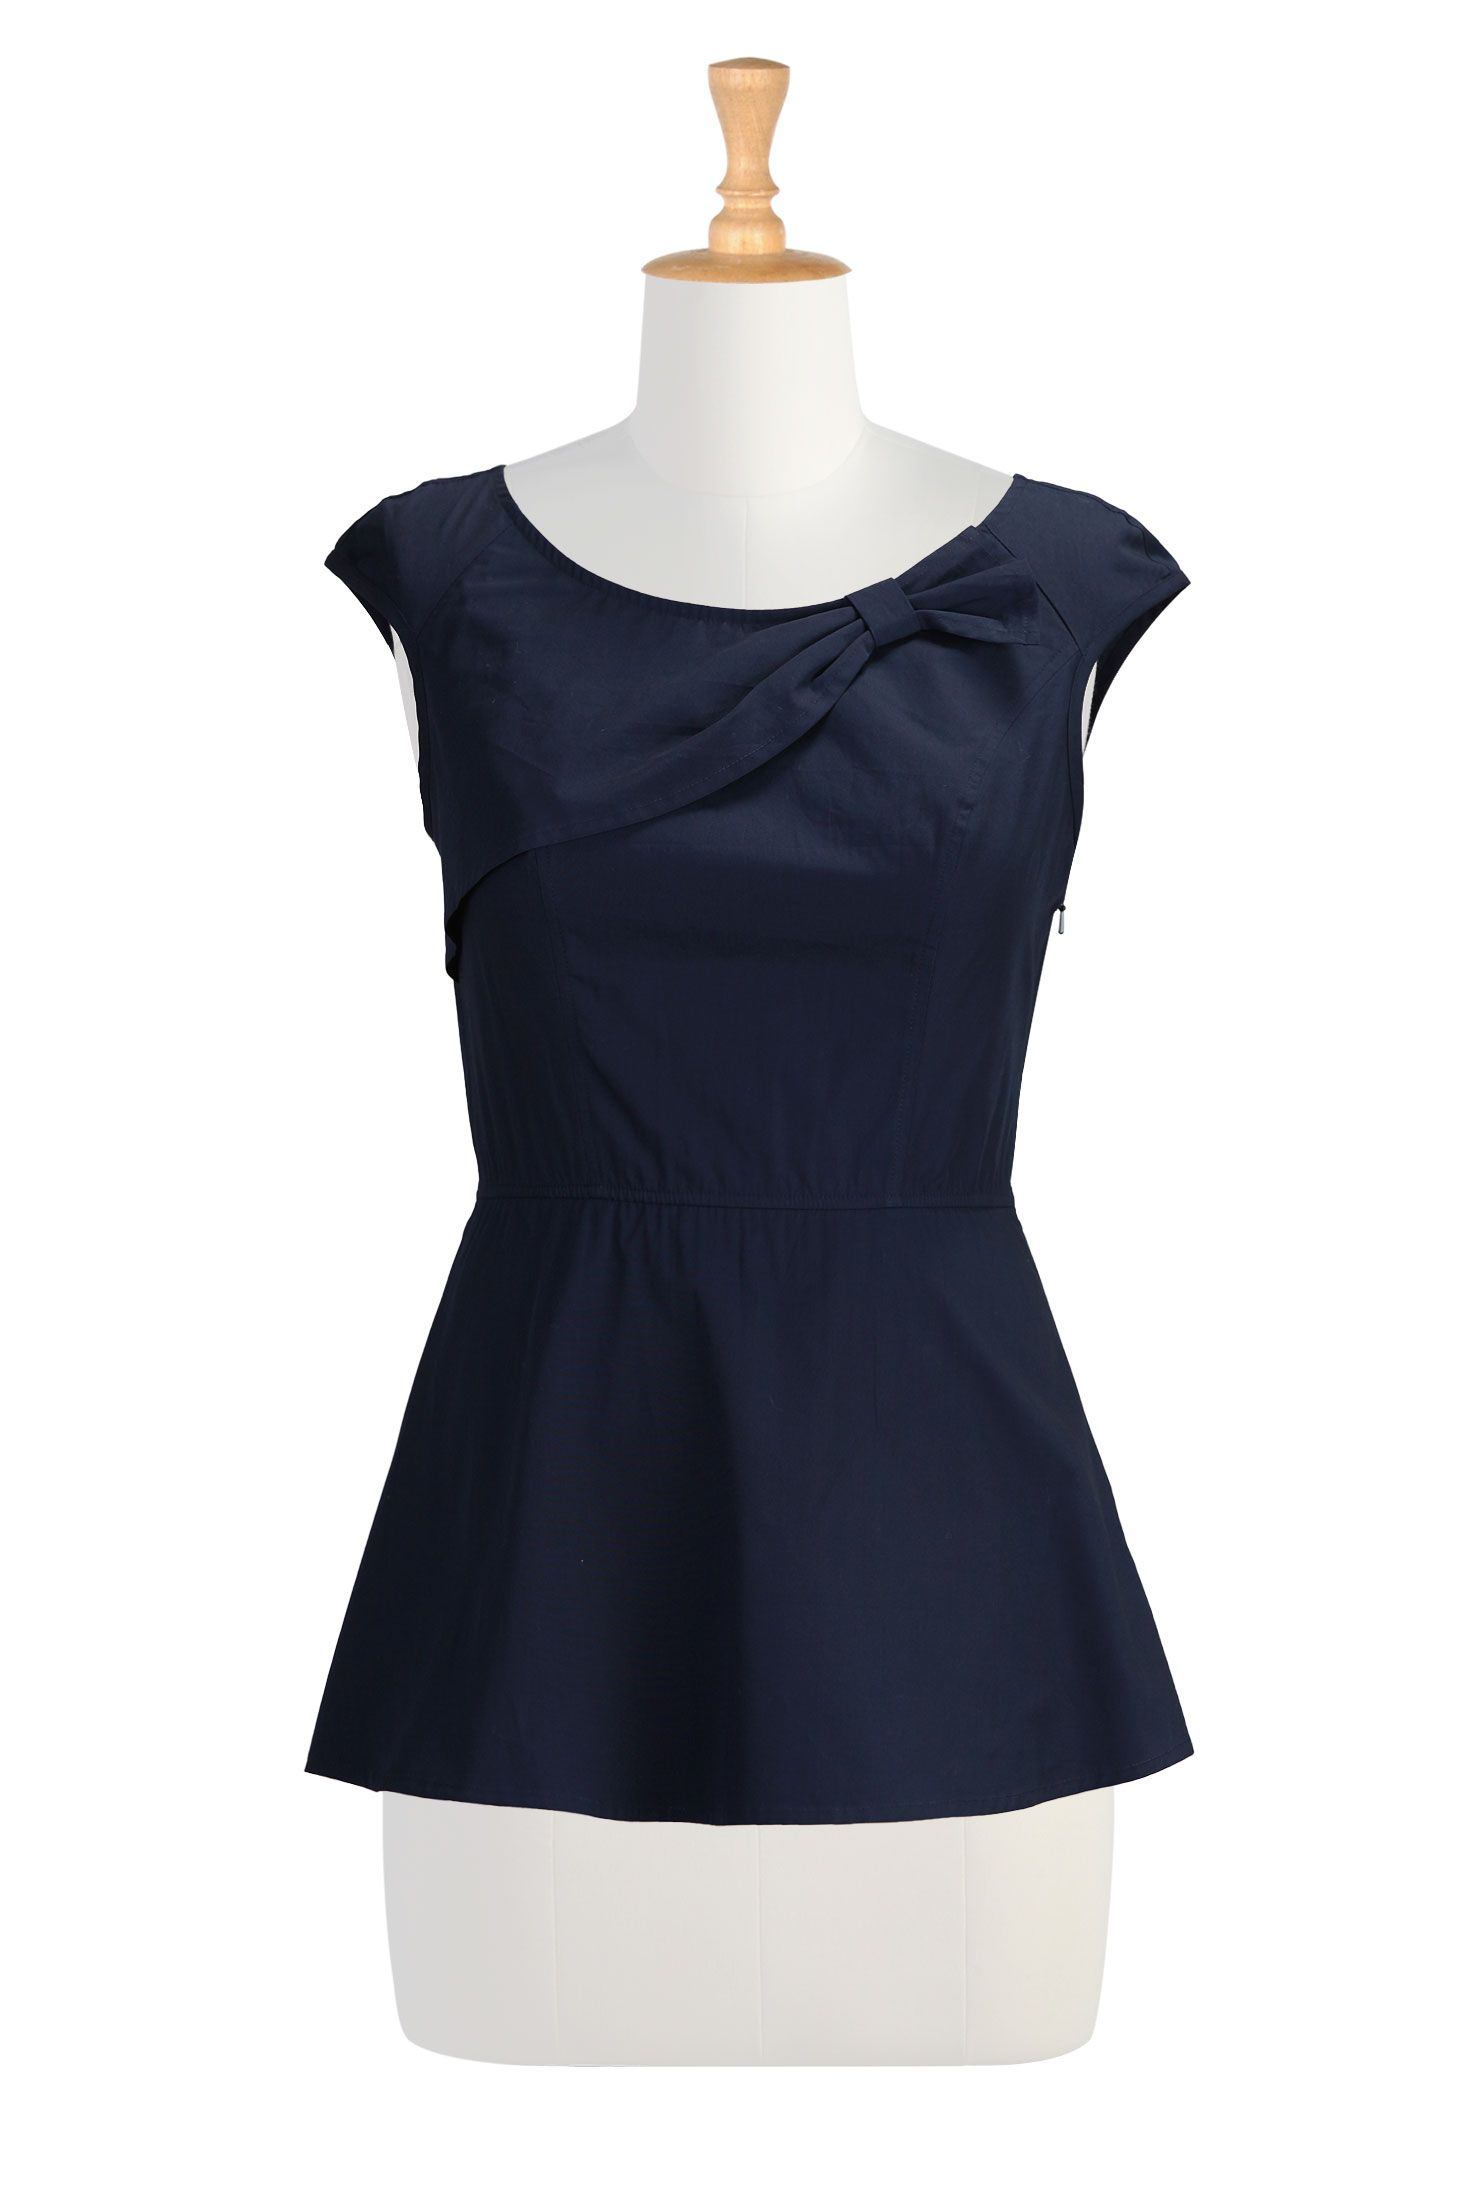 cb5f8d31eb Deep Navy Poplin Tops, Bow-Tied Peplum Cotton Tops Women's designer fashion  - Shop Women's Tunic Tops - Embellished Tops, Long Sleeve Tops, .